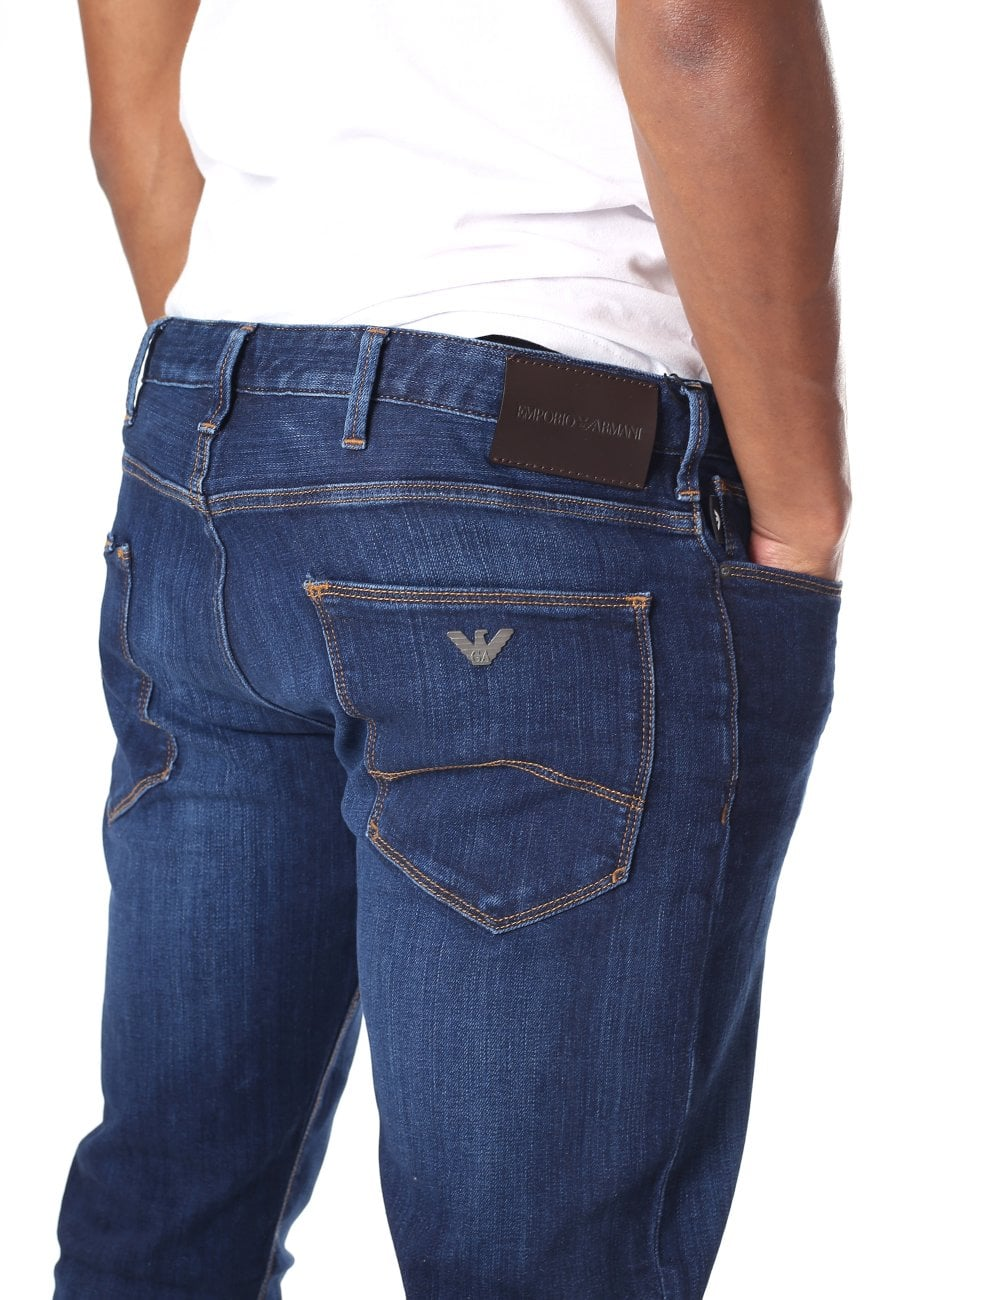 best authentic 609e4 40a67 Emporio Armani Men's Blue Denim Jean